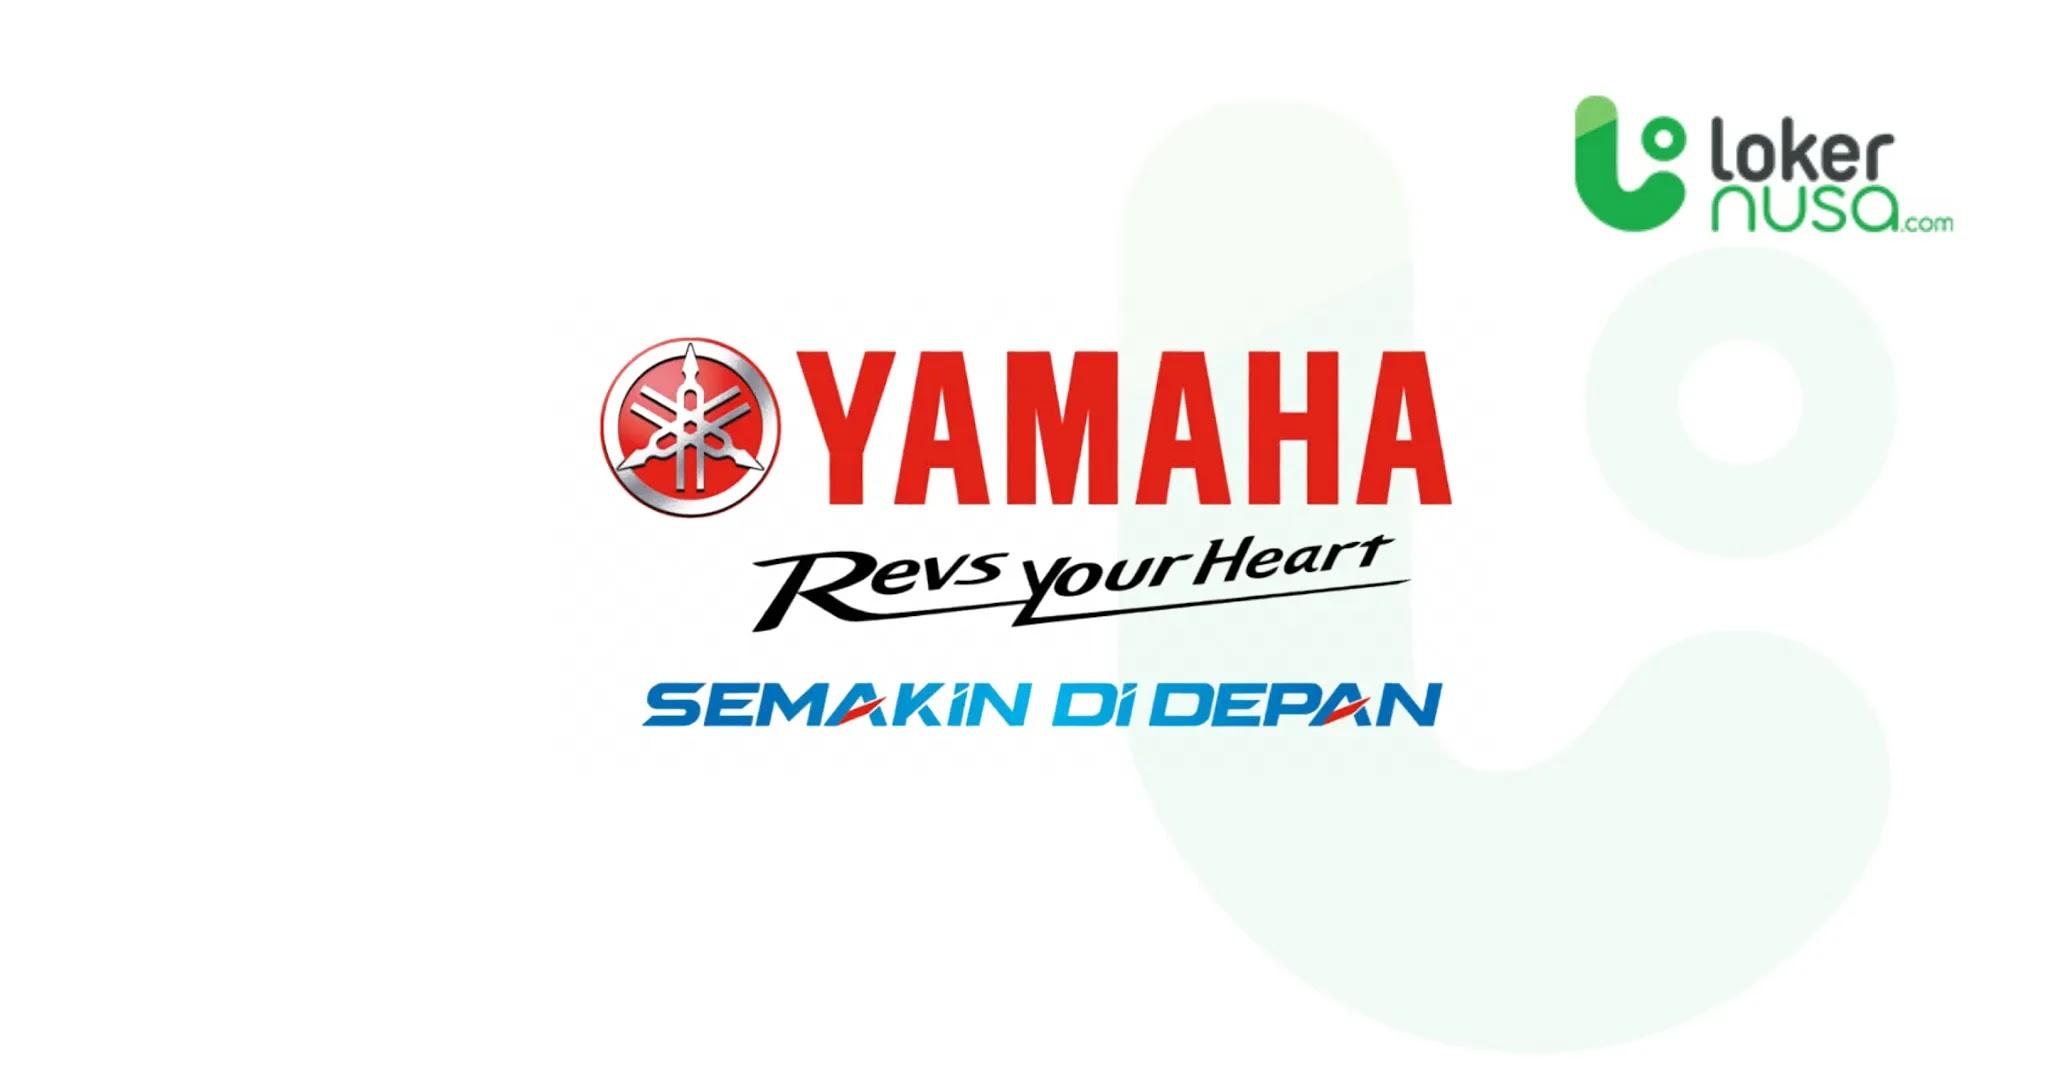 Lowongan Kerja Terbaru Yamaha